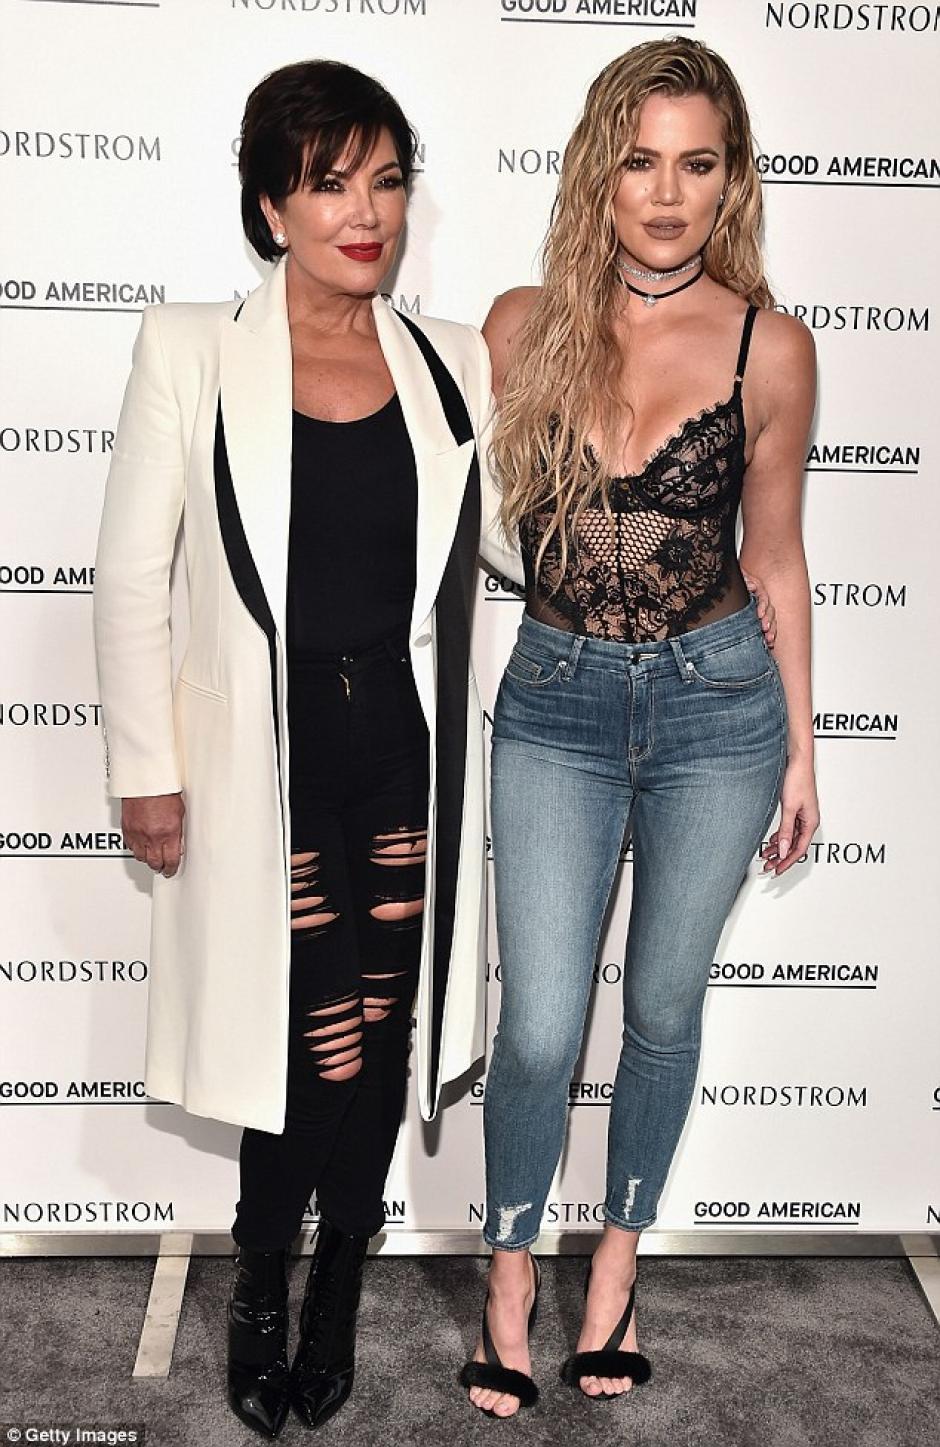 Khloé junto a su madre Kriss Jenner. (Foto: dailymail)